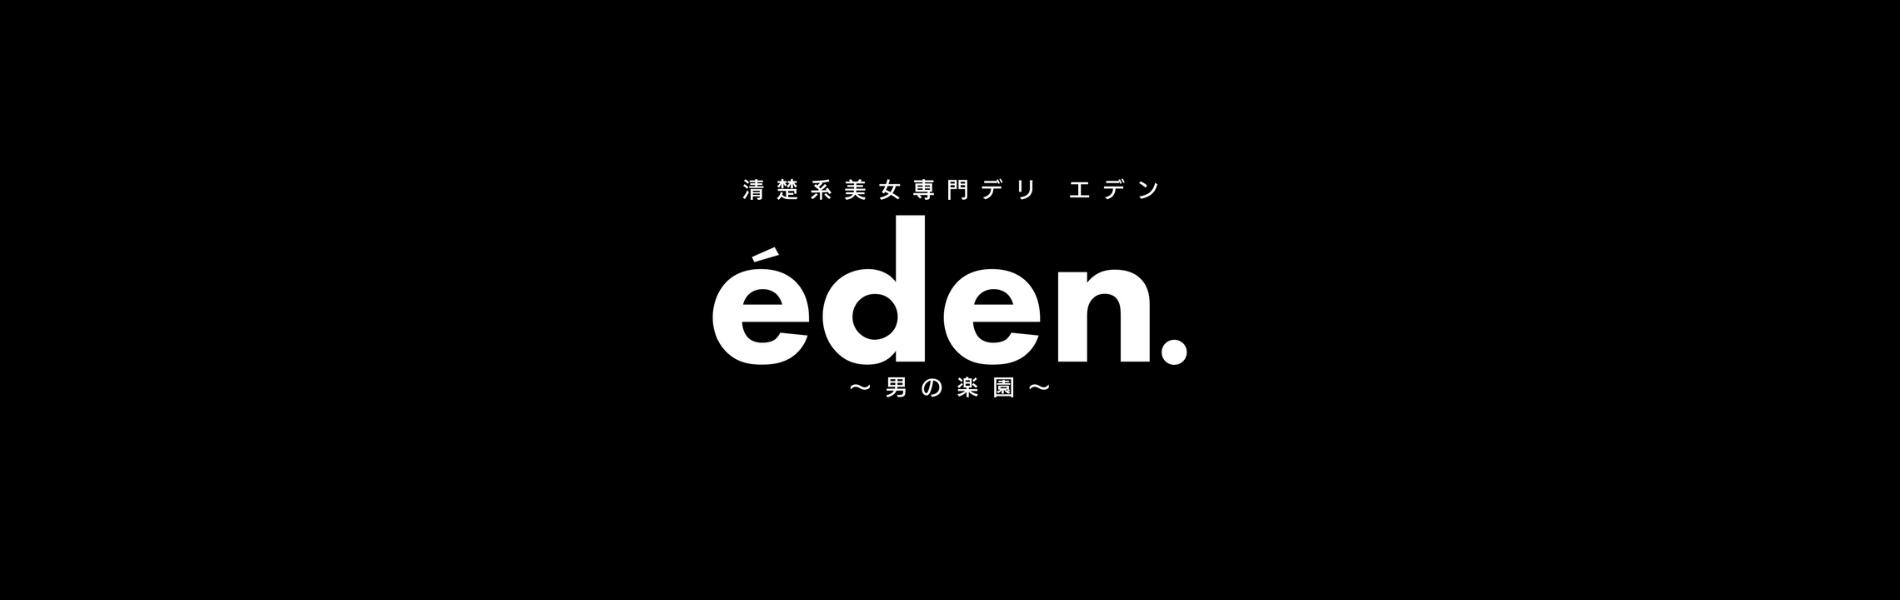 https://www.cityheaven.net/aichi/A2301/A230103/seiedenjogakuin/